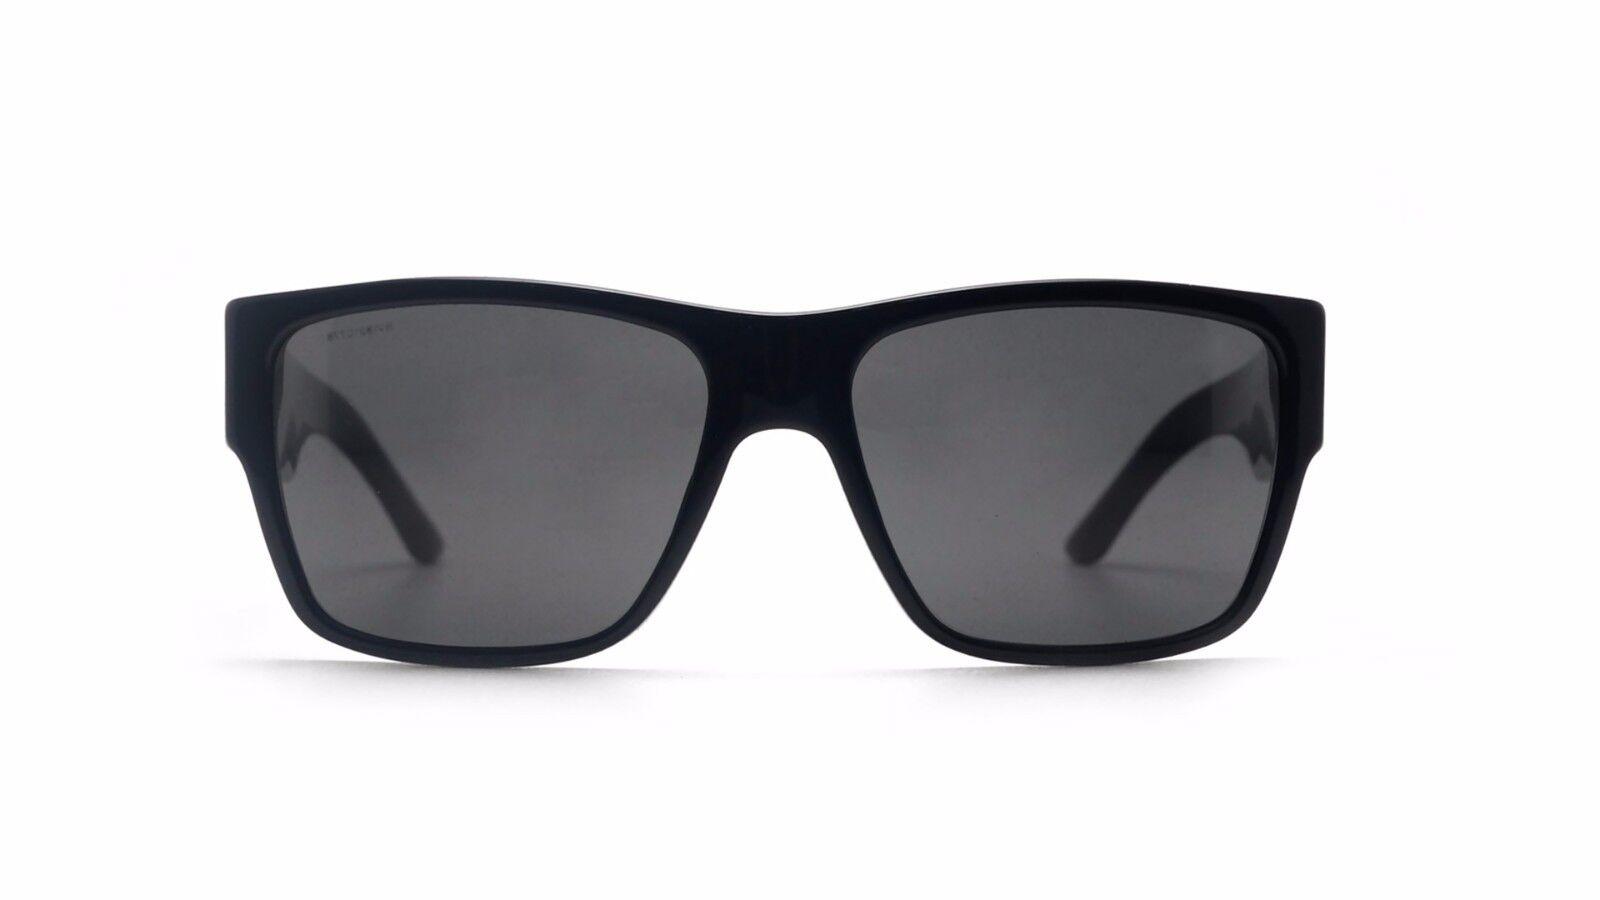 b1946bef436b VERSACE VE4296 Gb1 87 59mm Grey UV Lens Black Frame Men s Sunglasses ...